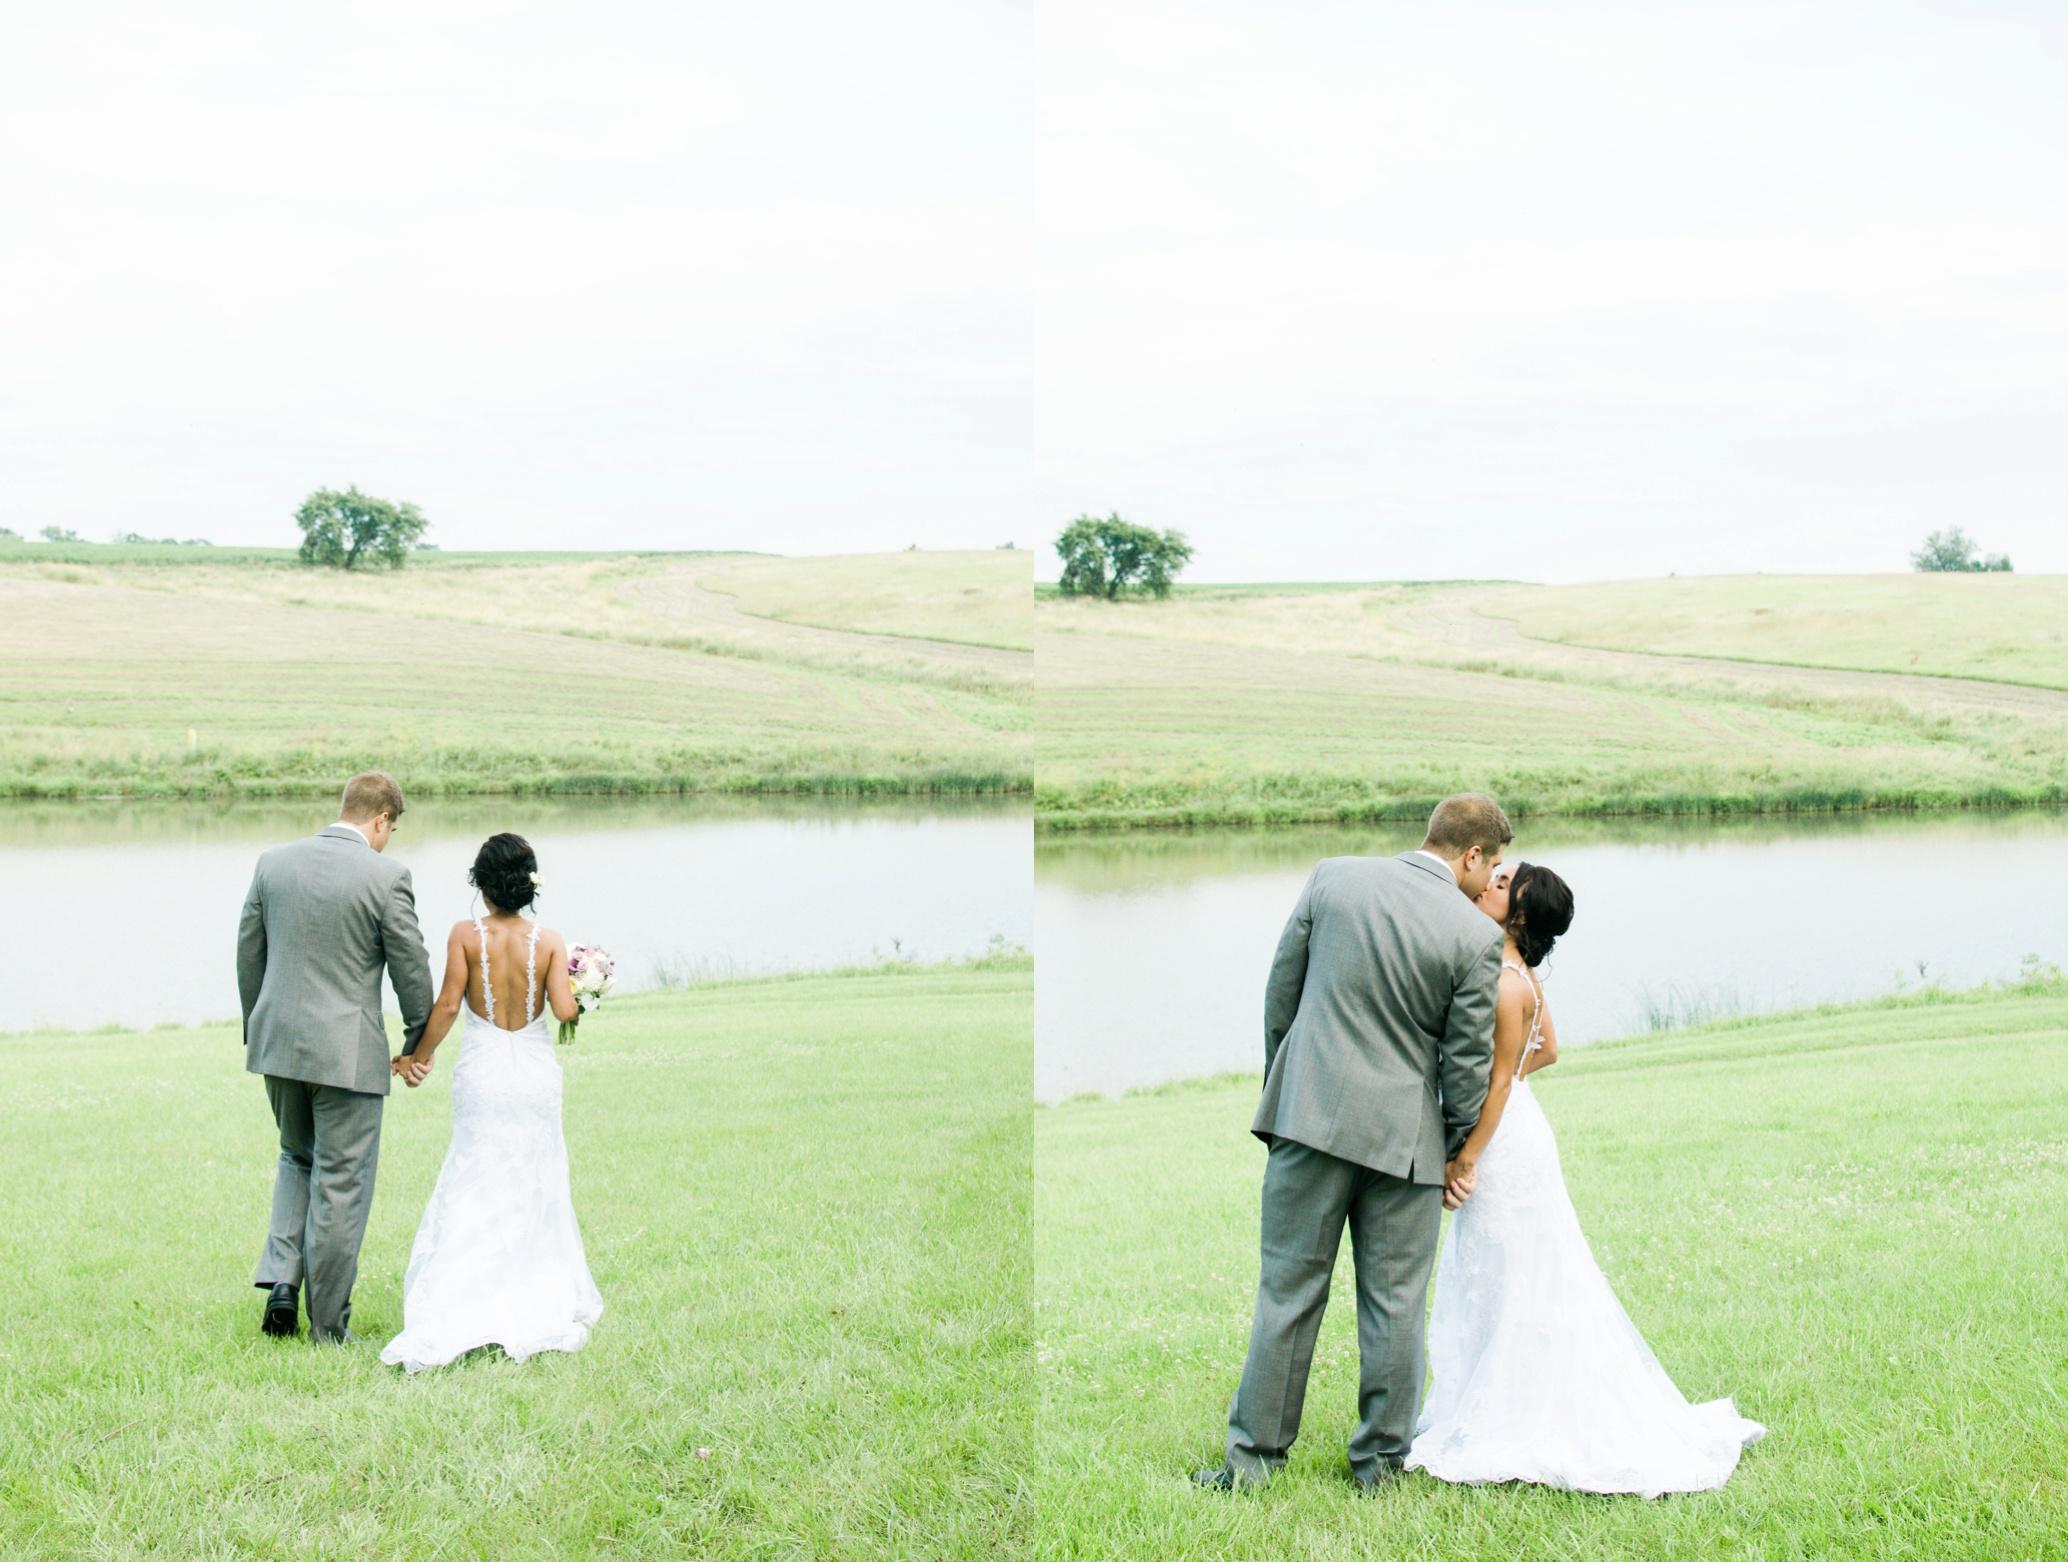 Barnes' Place Rustic Outdoor Wedding | Ali Leigh Photo Minneapolis Wedding Photographer_0198.jpg